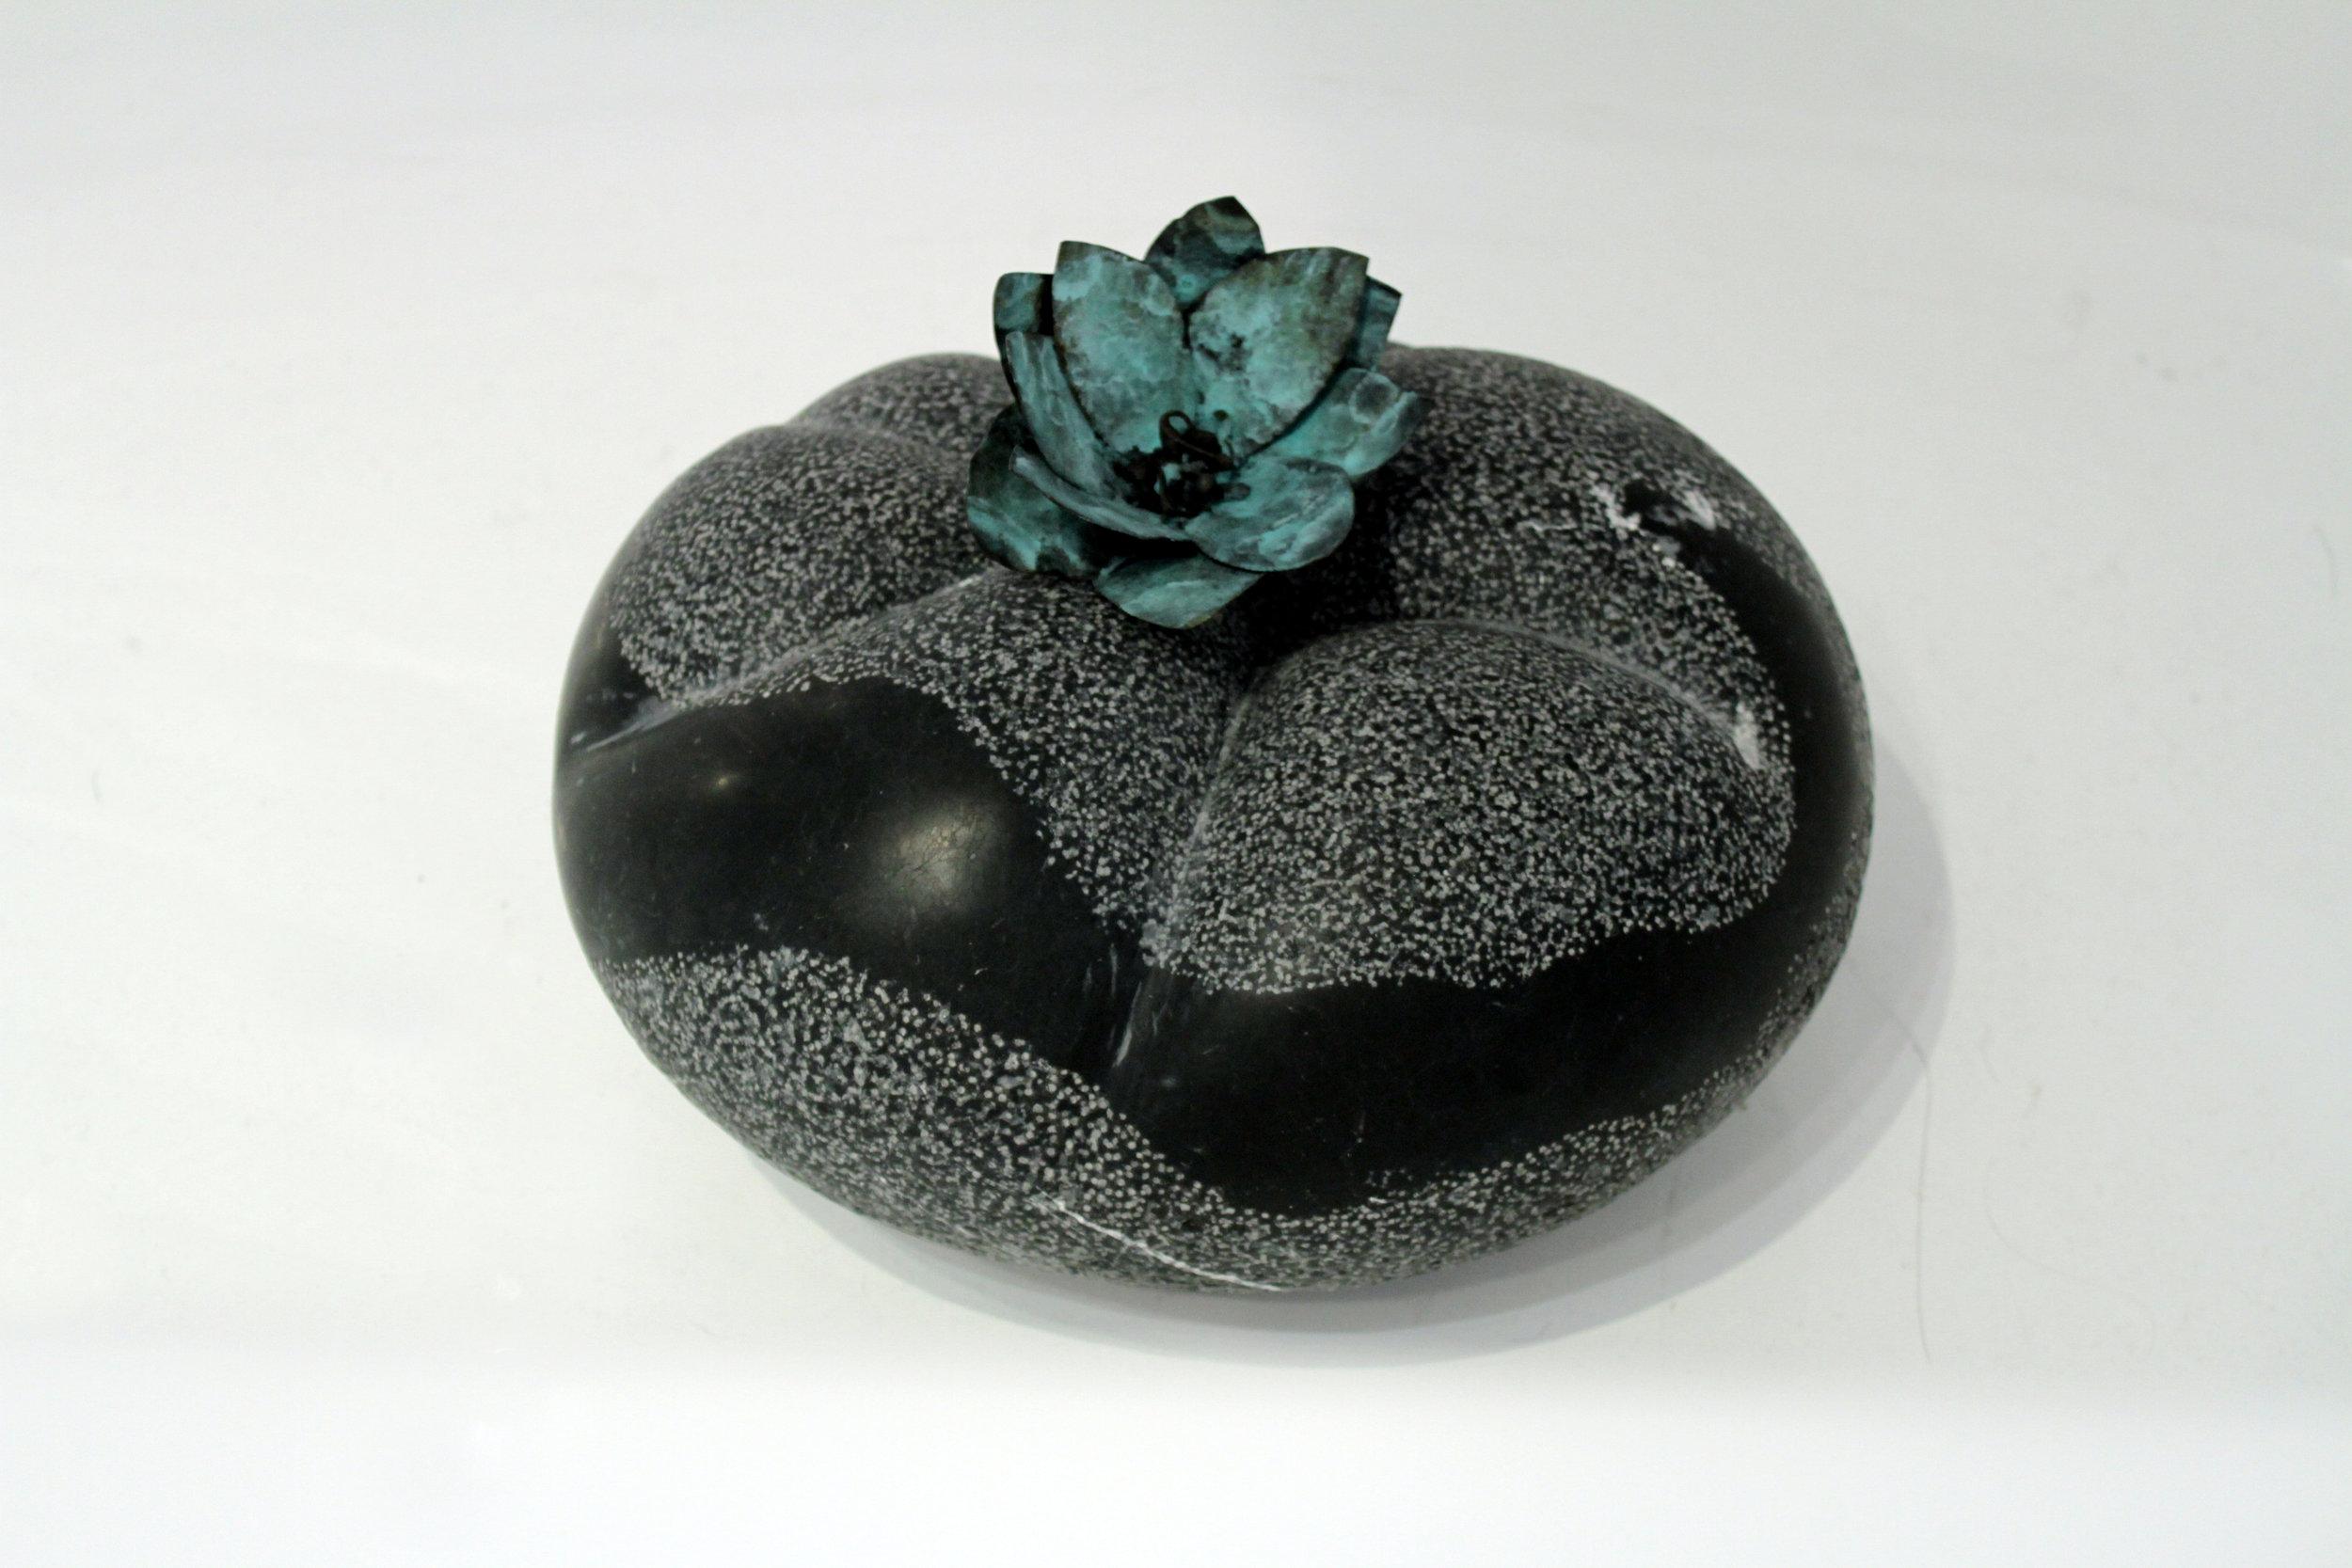 Harmony 1 /15 x 40 x 20 (cm), Marble, Bronze (Private collection, Australia) 2015